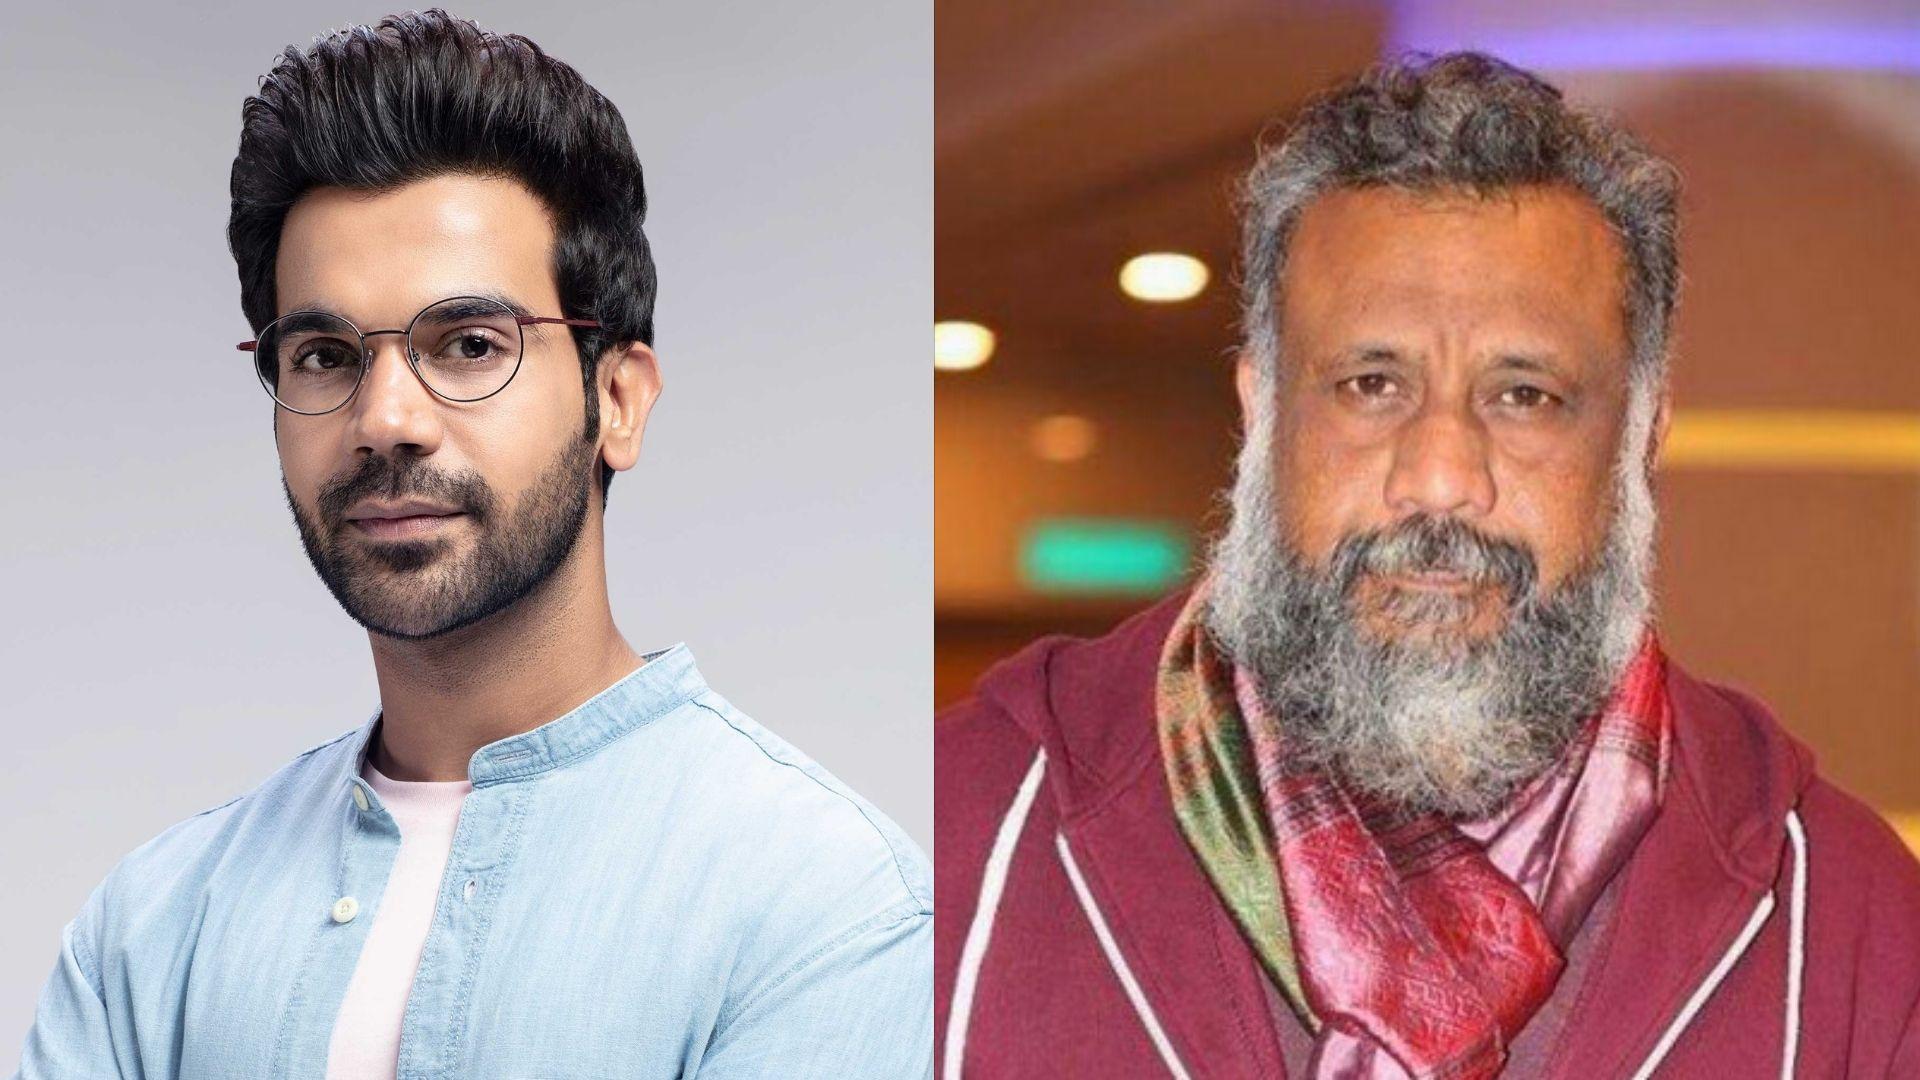 Bheed: Rajkummar Rao Roped In For Socio-Political Drama Helmed By Anubhav Sinha